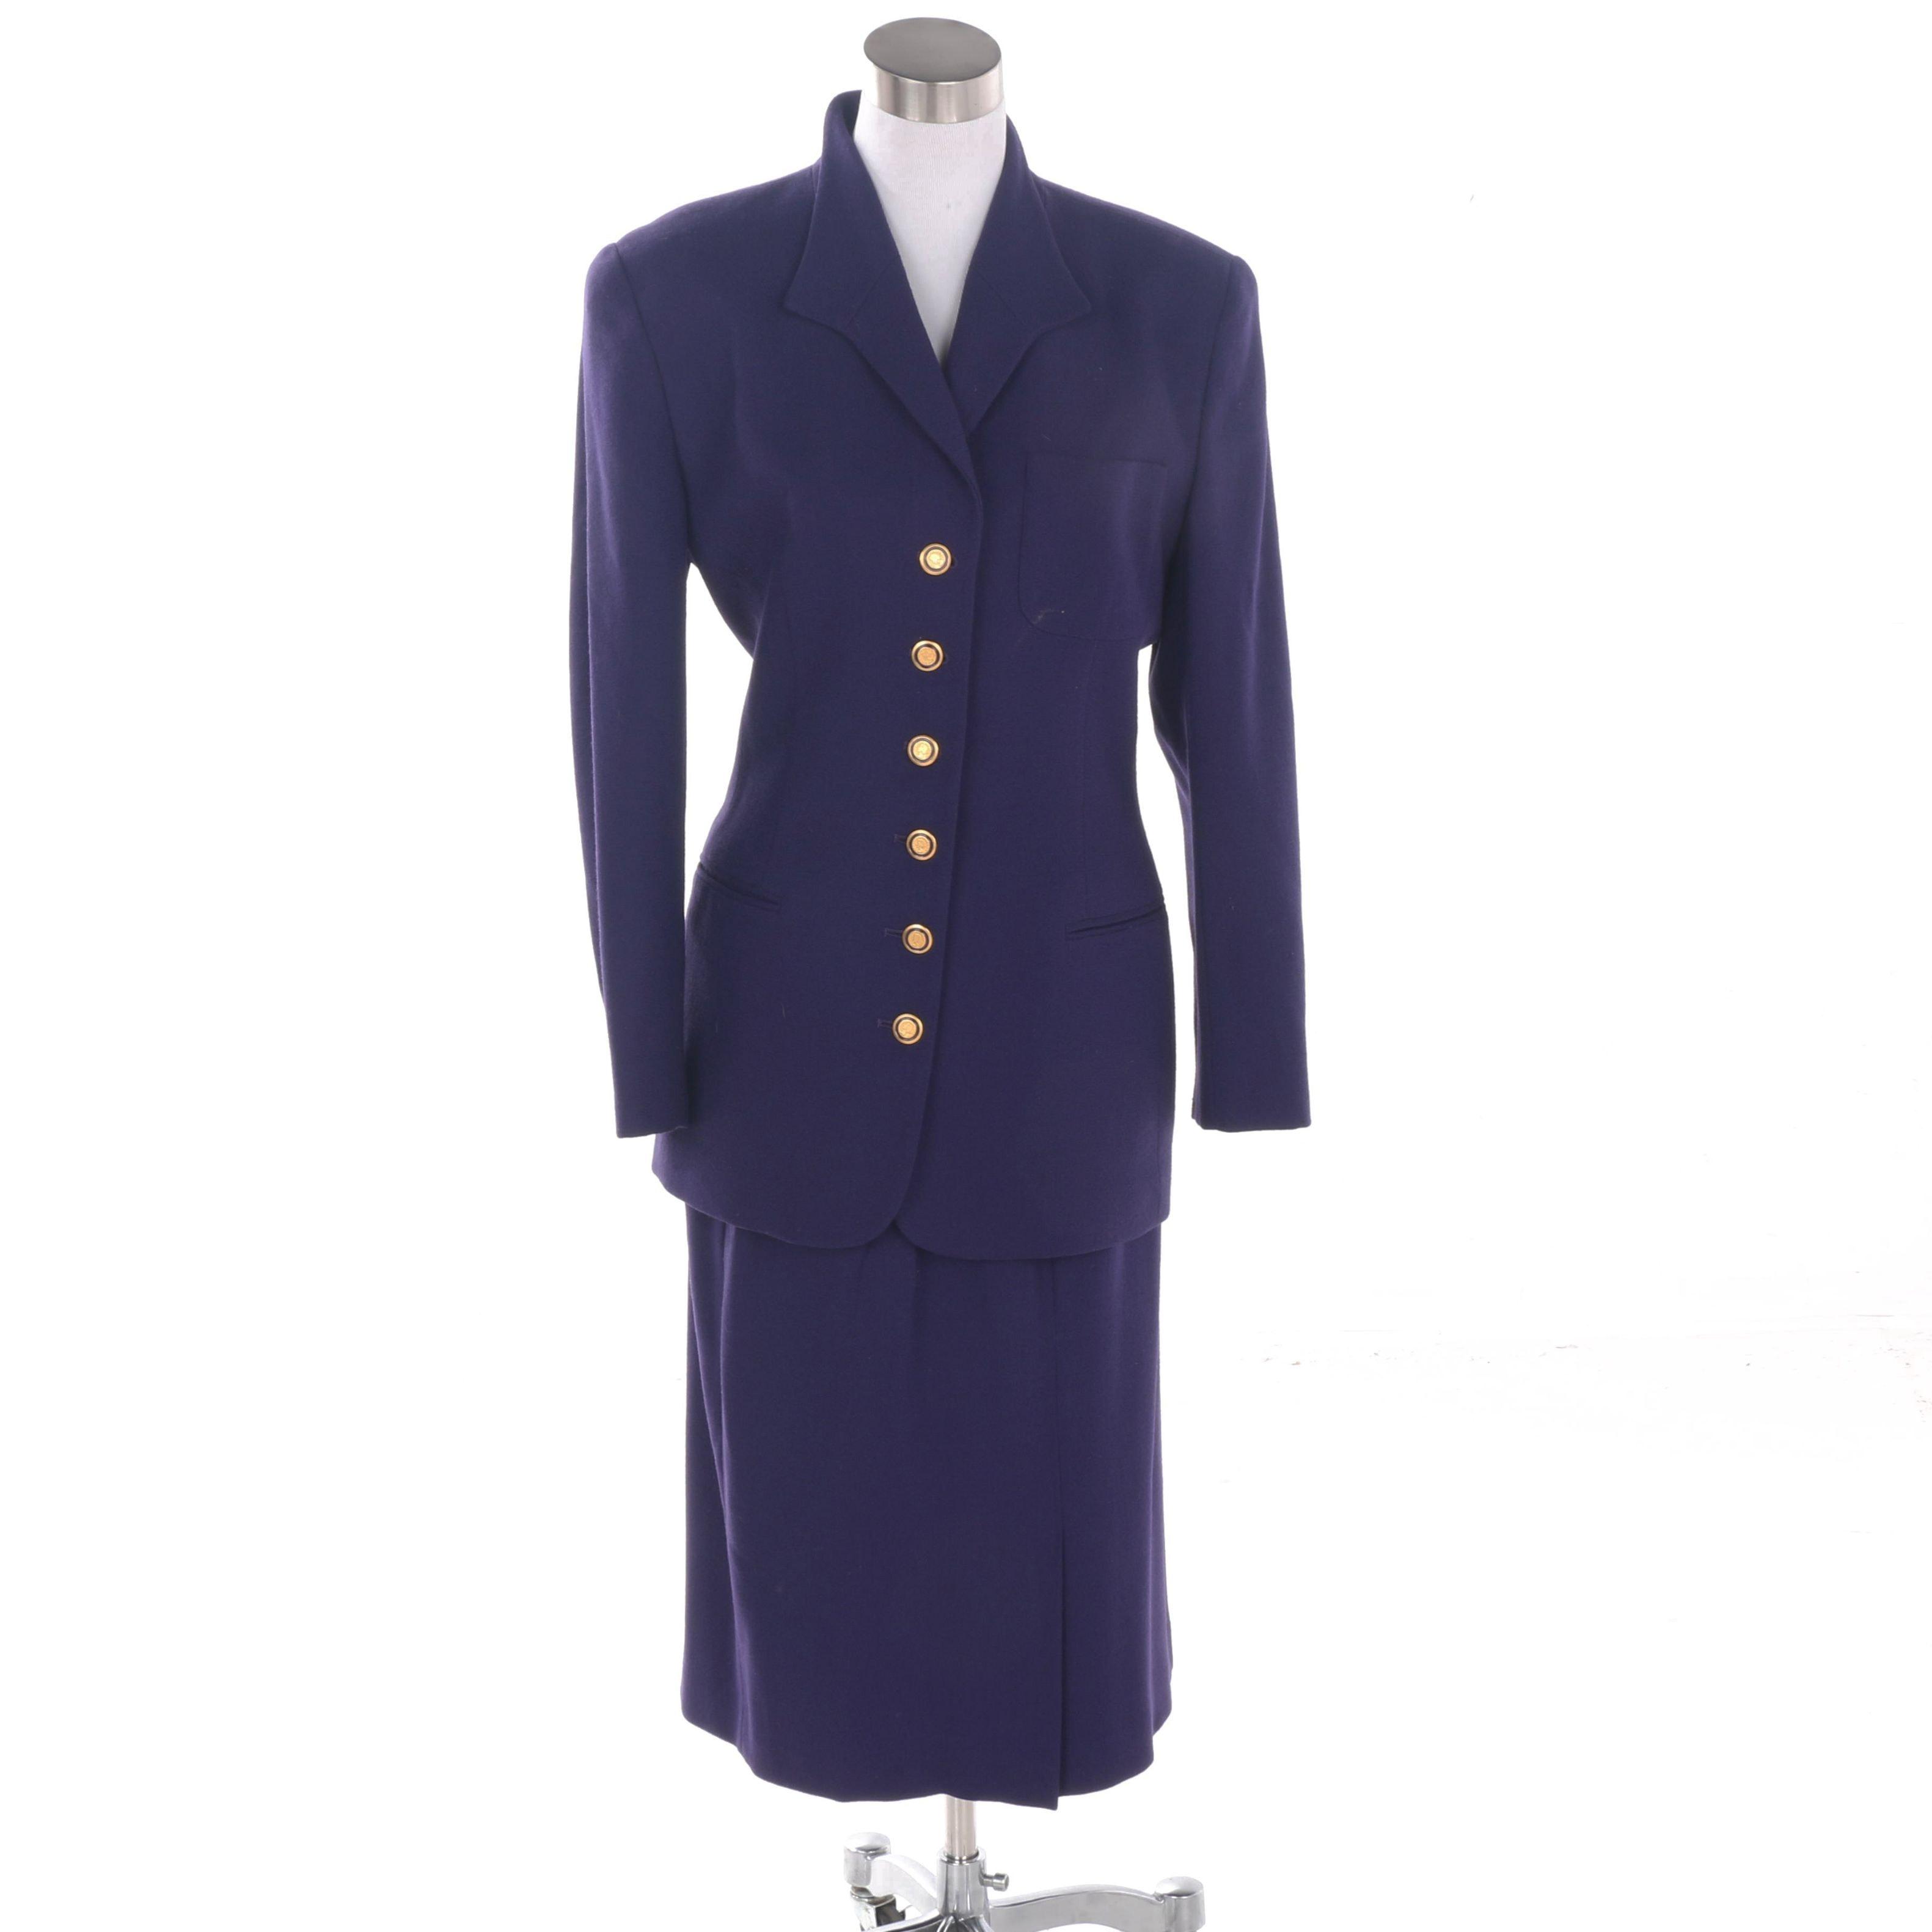 Vintage Christian Dior Purple Wool Skirt Suit